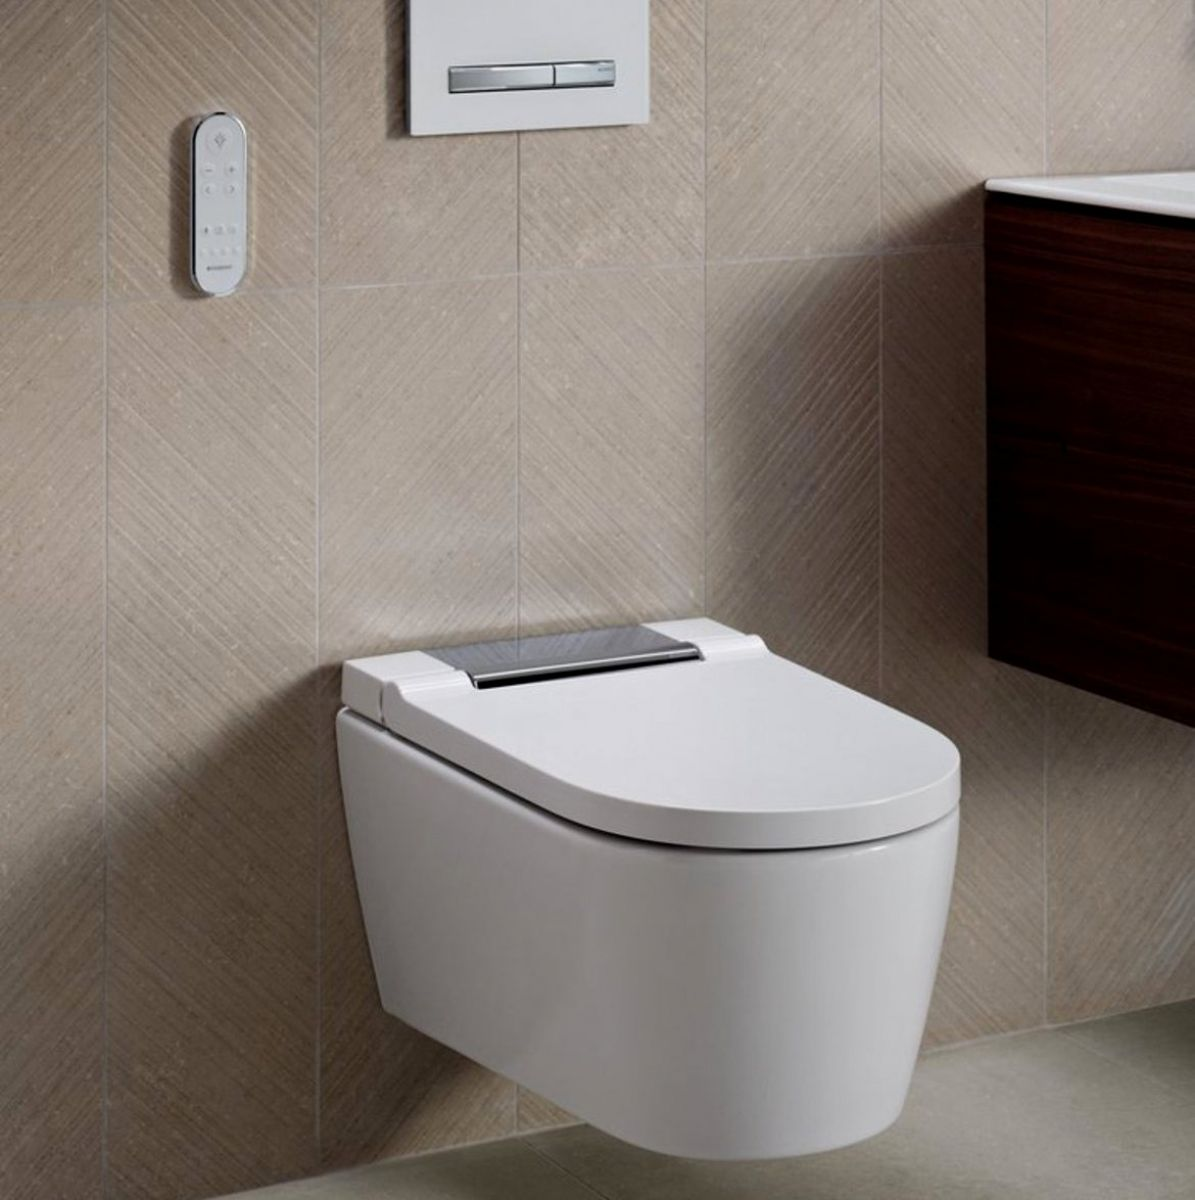 Geberit Aquaclean Sela Wall Hung Shower Toilet - 146220211